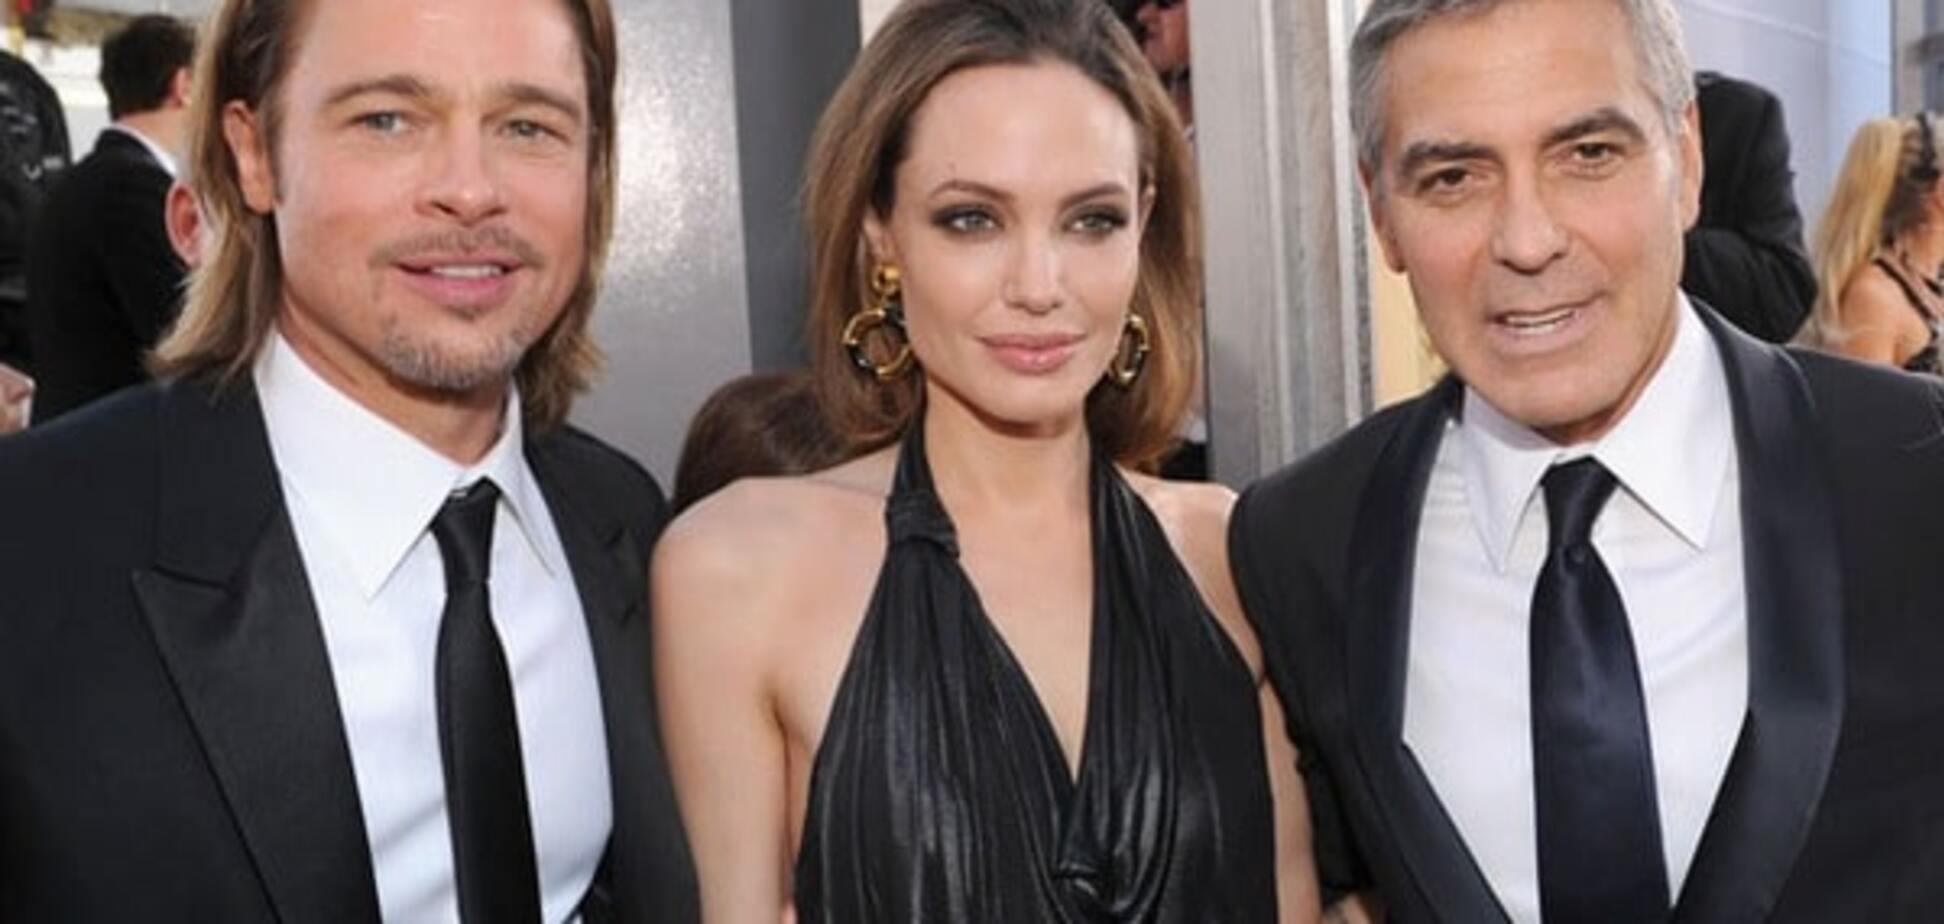 Развод Анджелины Джоли и Брэда Питта прокомментировал Джордж Клуни